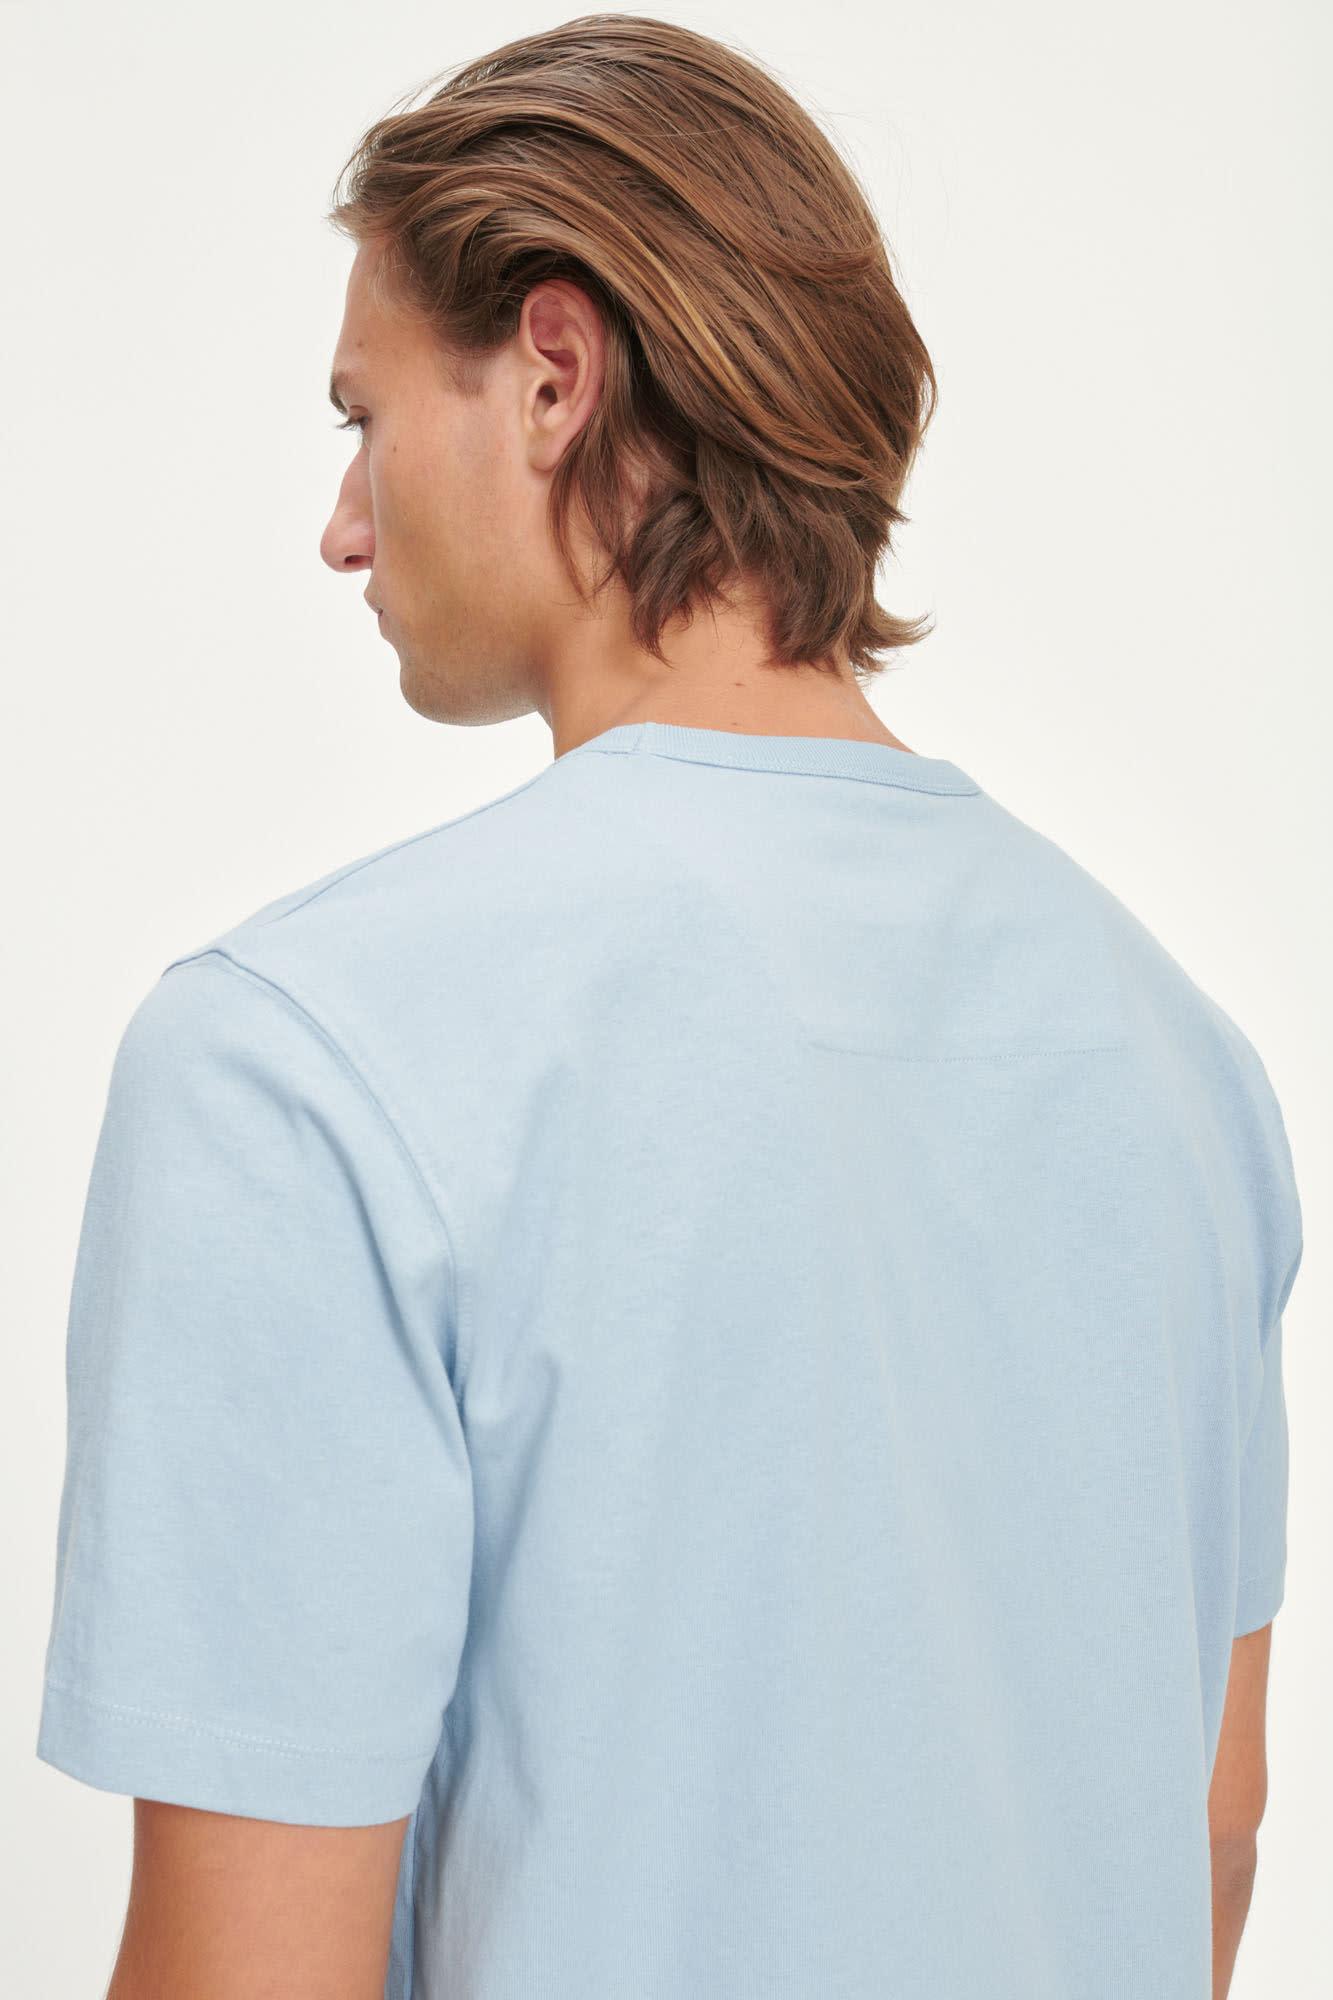 Hugo Cotton T-Shirt Dusty Blue-4